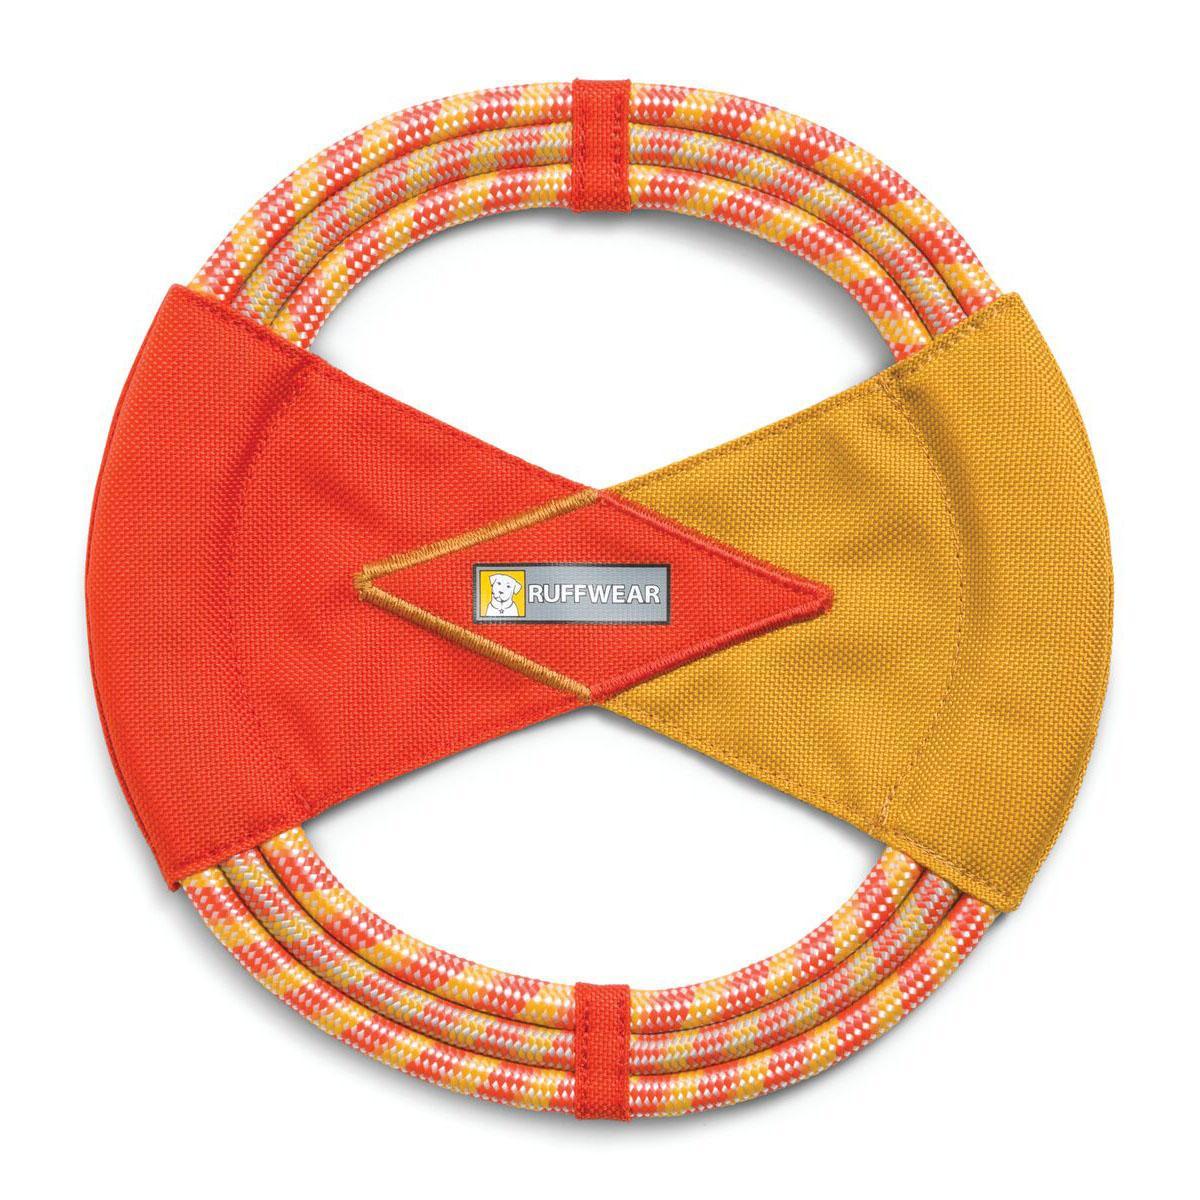 Pacific Ring Dog Toy by RuffWear - Sockeye Red